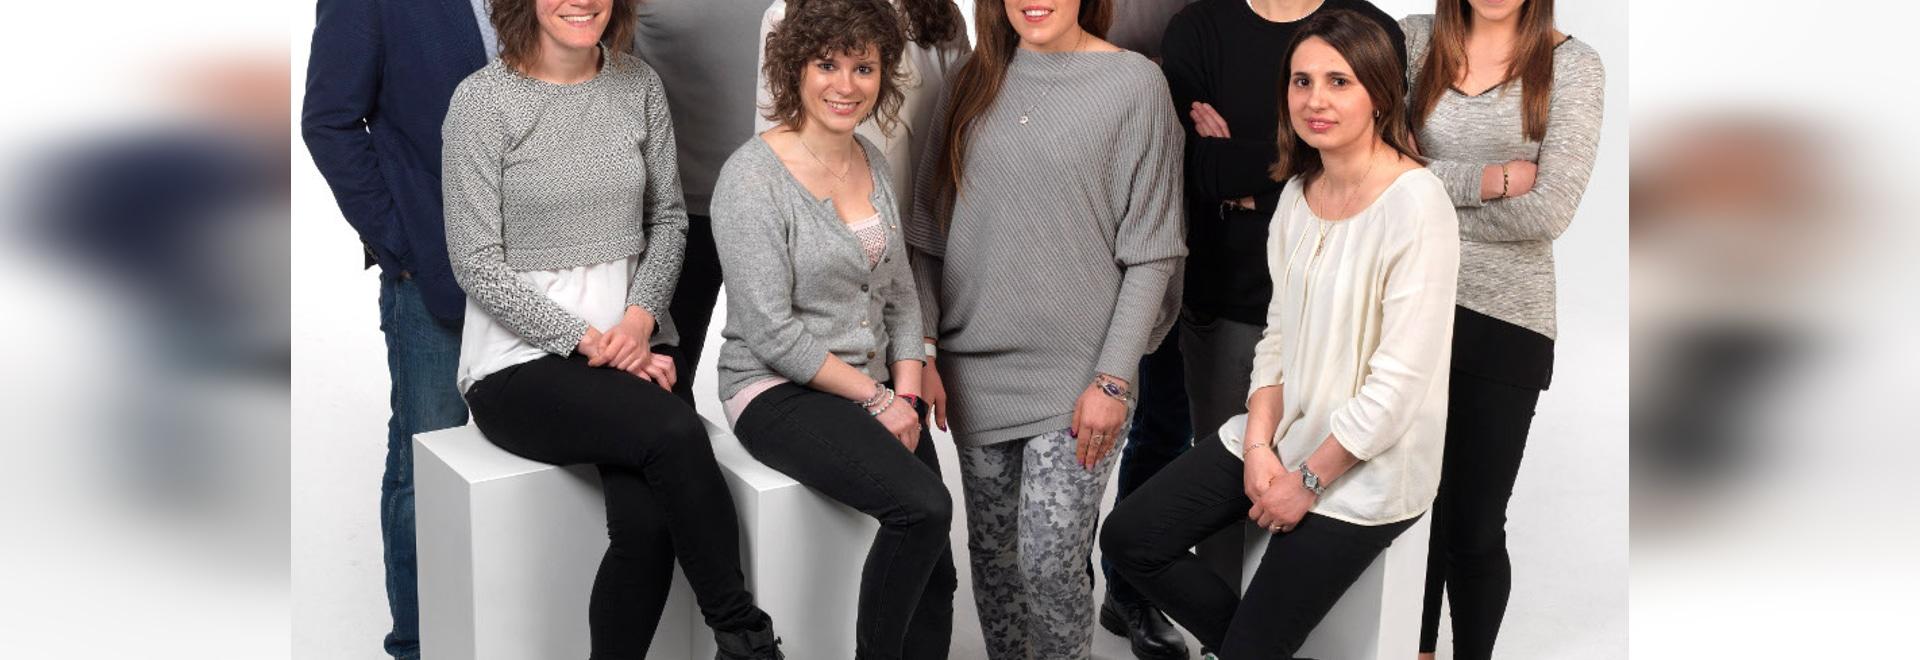 Lithos Design Team